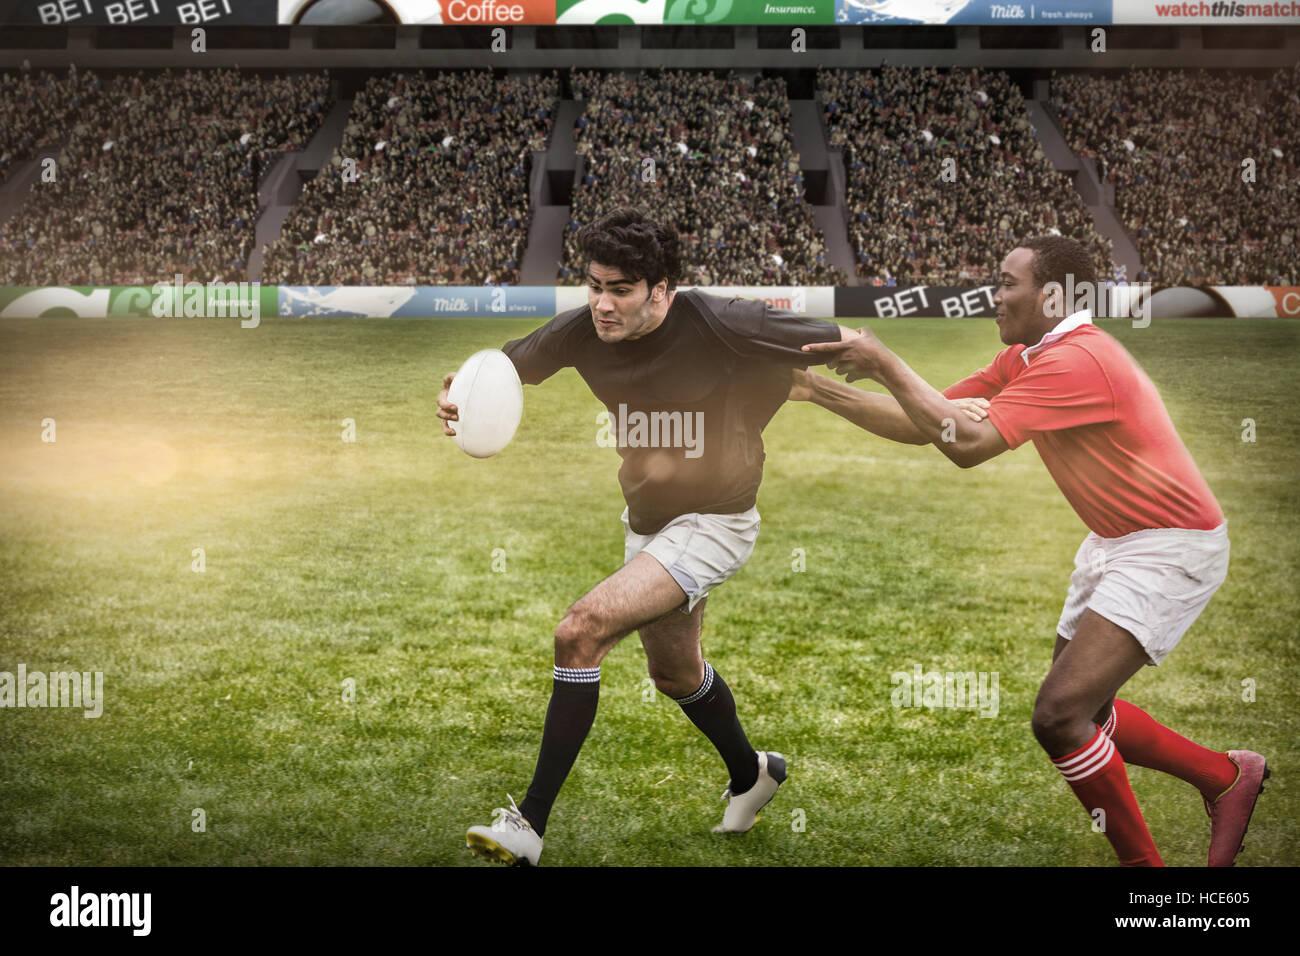 Immagine composita di rugby fan in arena Immagini Stock